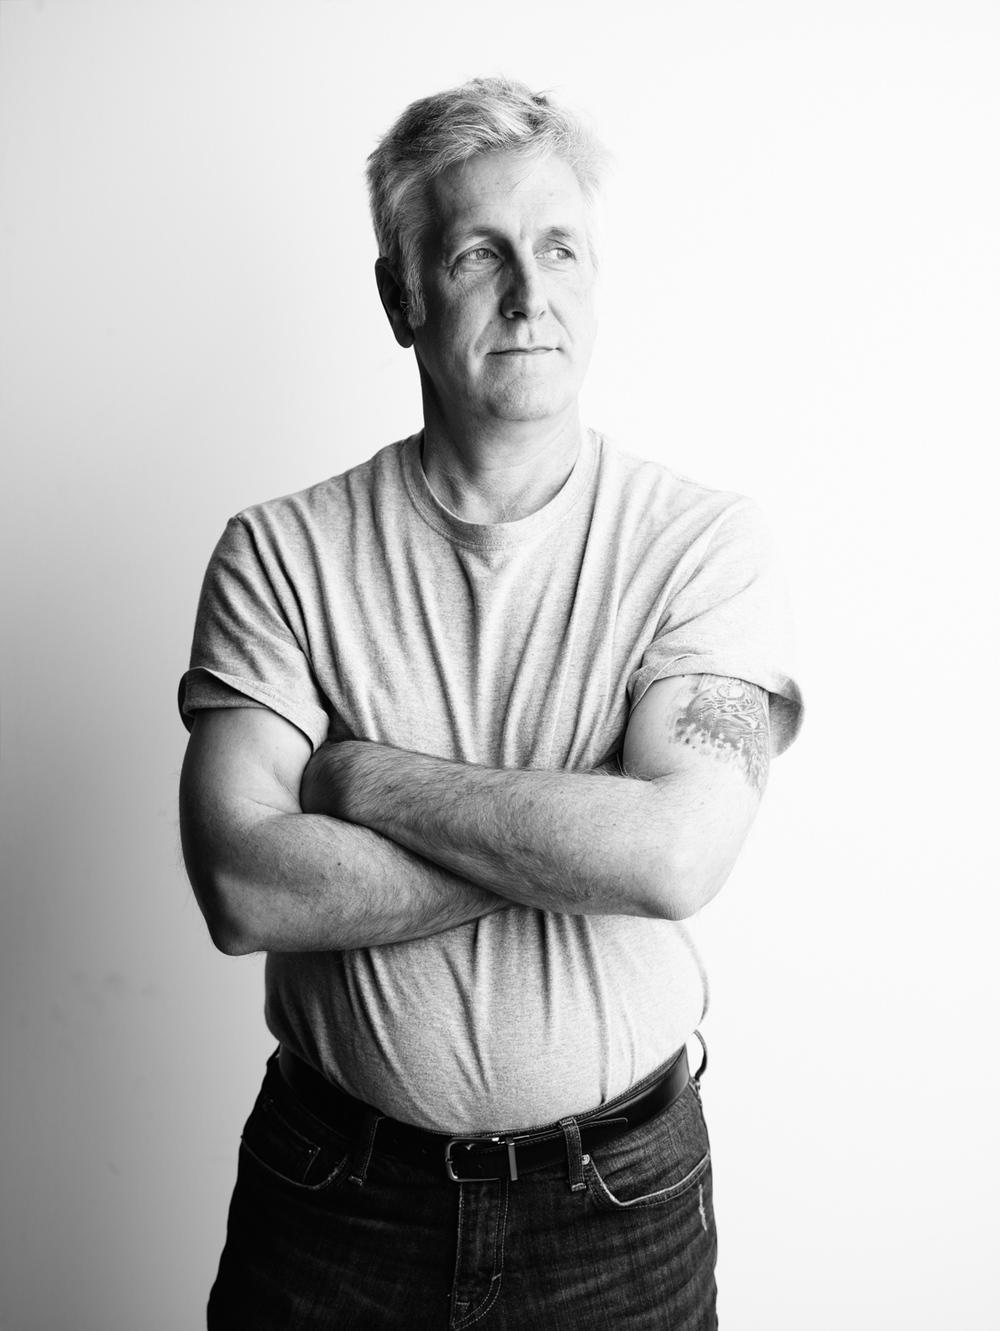 Jim Wren